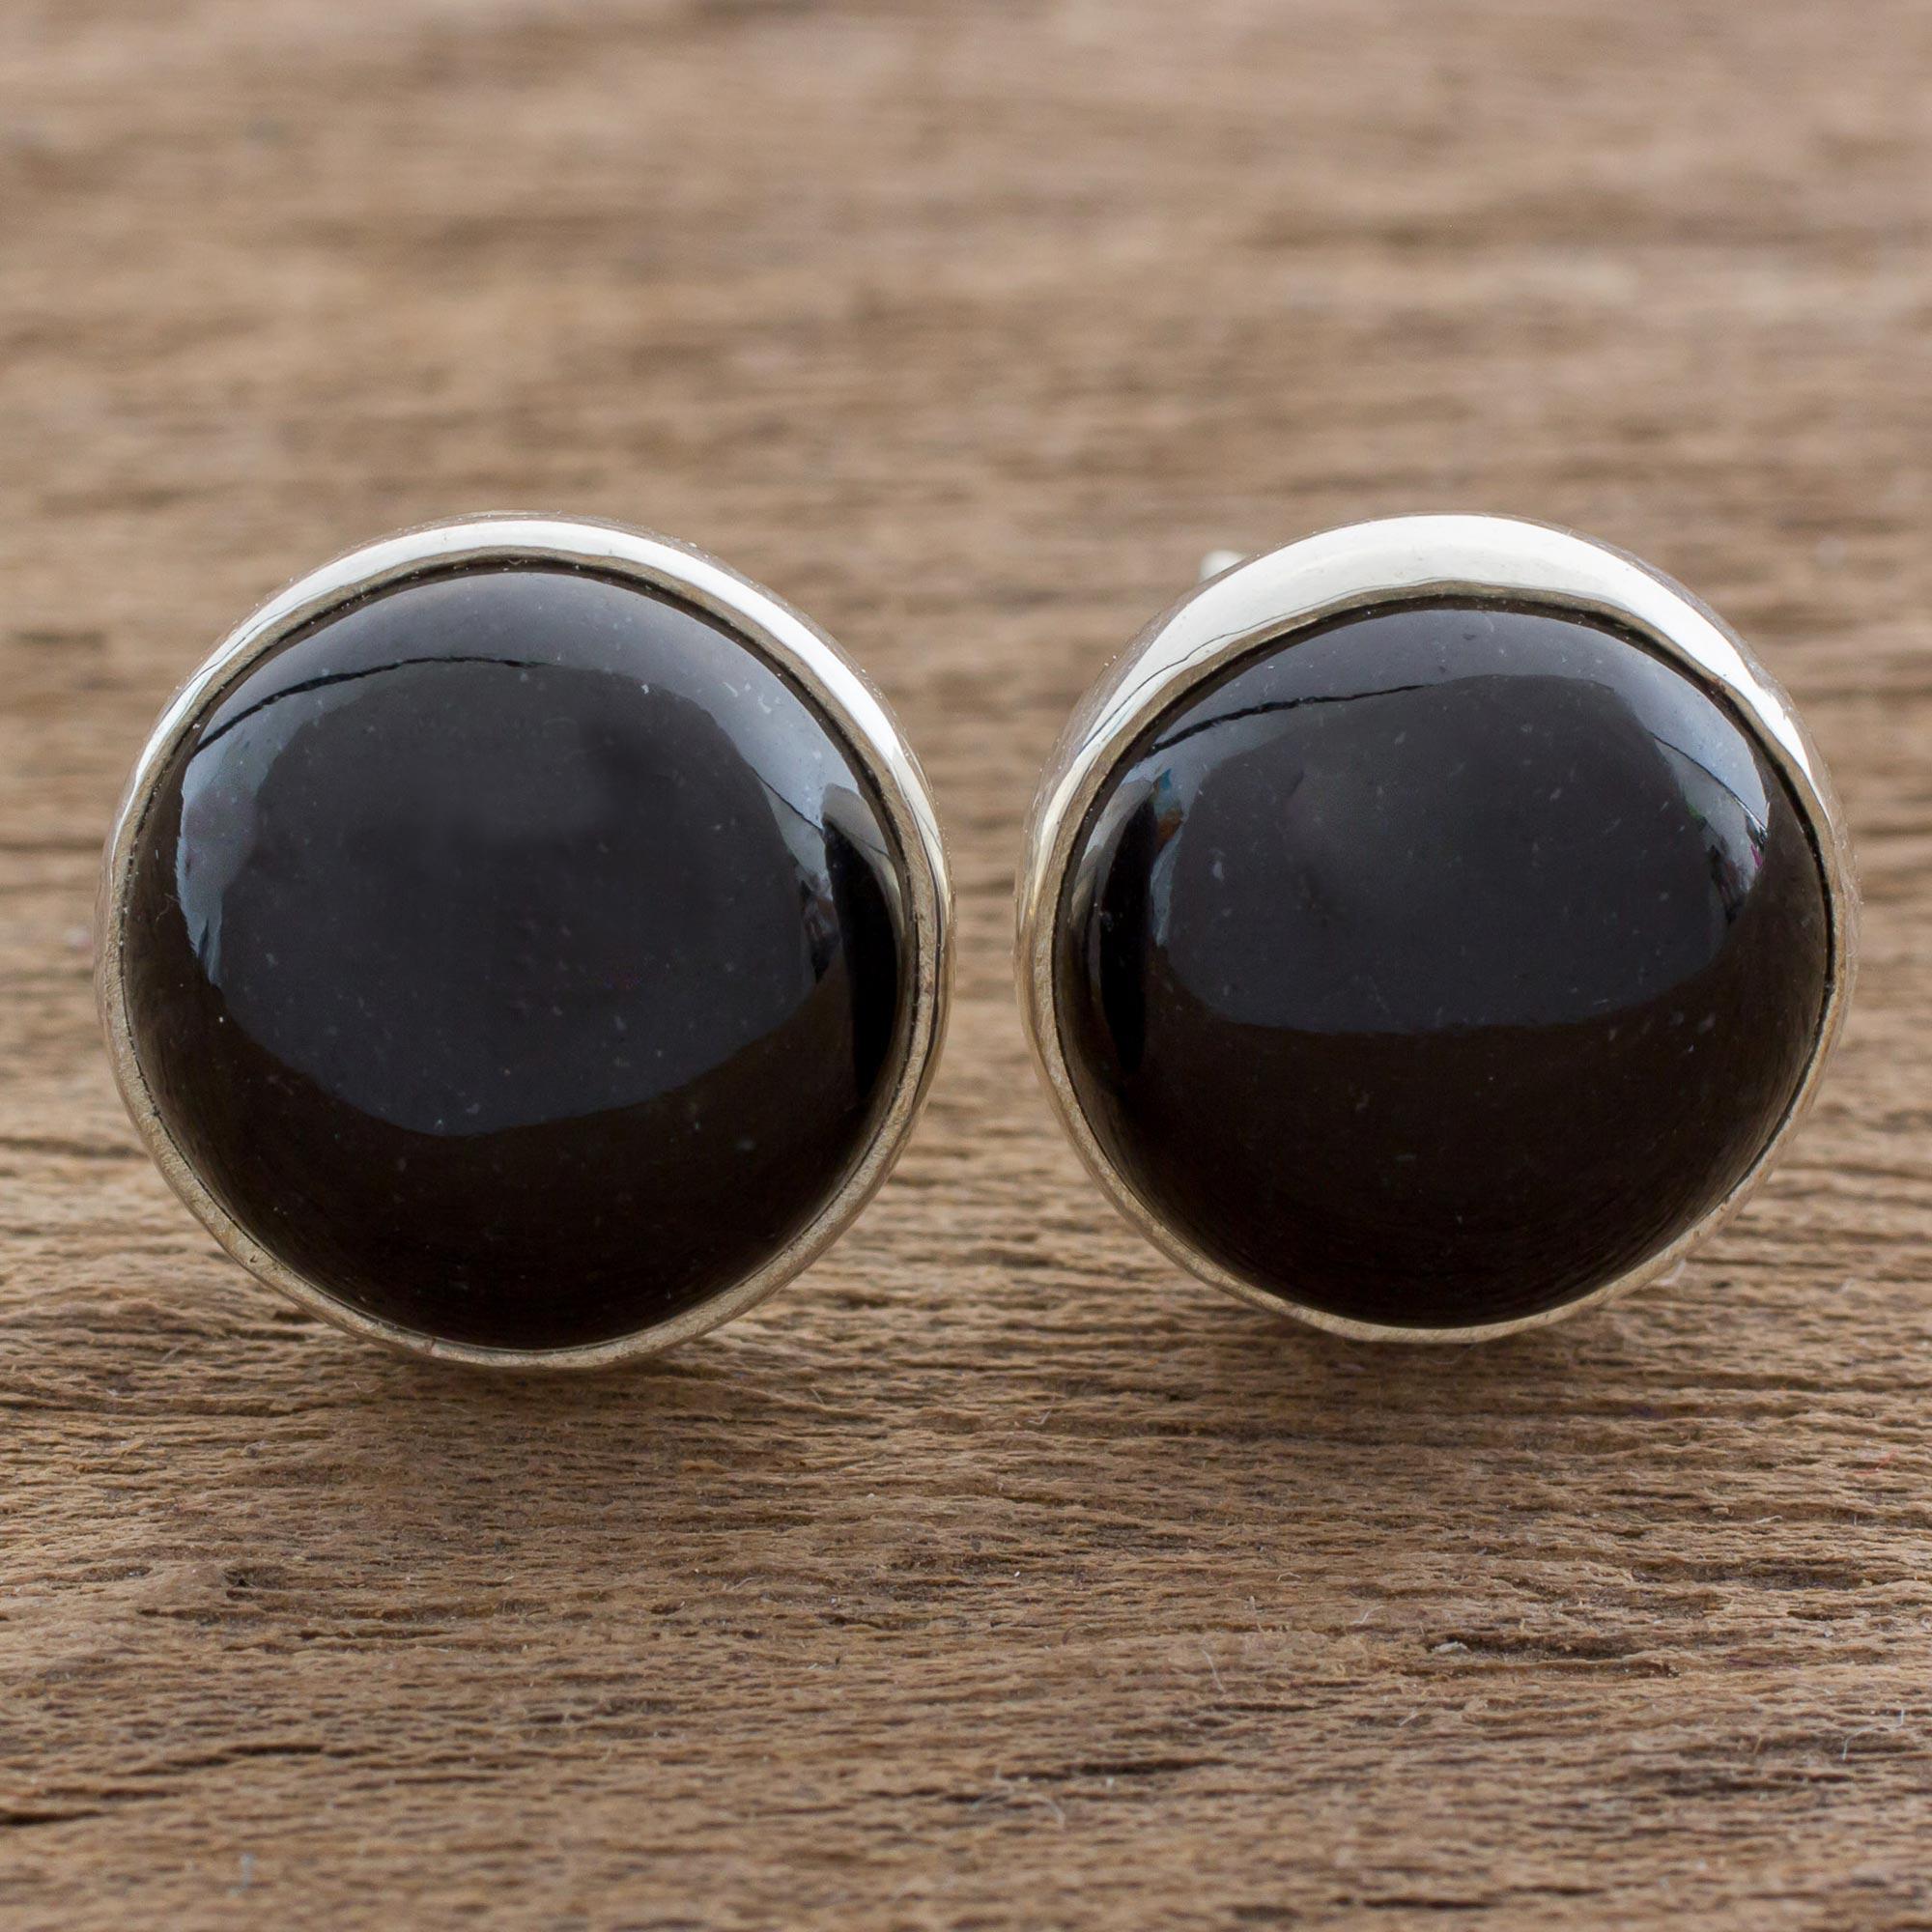 08c26c00b Unicef UK Market | Round Black Jade Button Earrings on Sterling ...